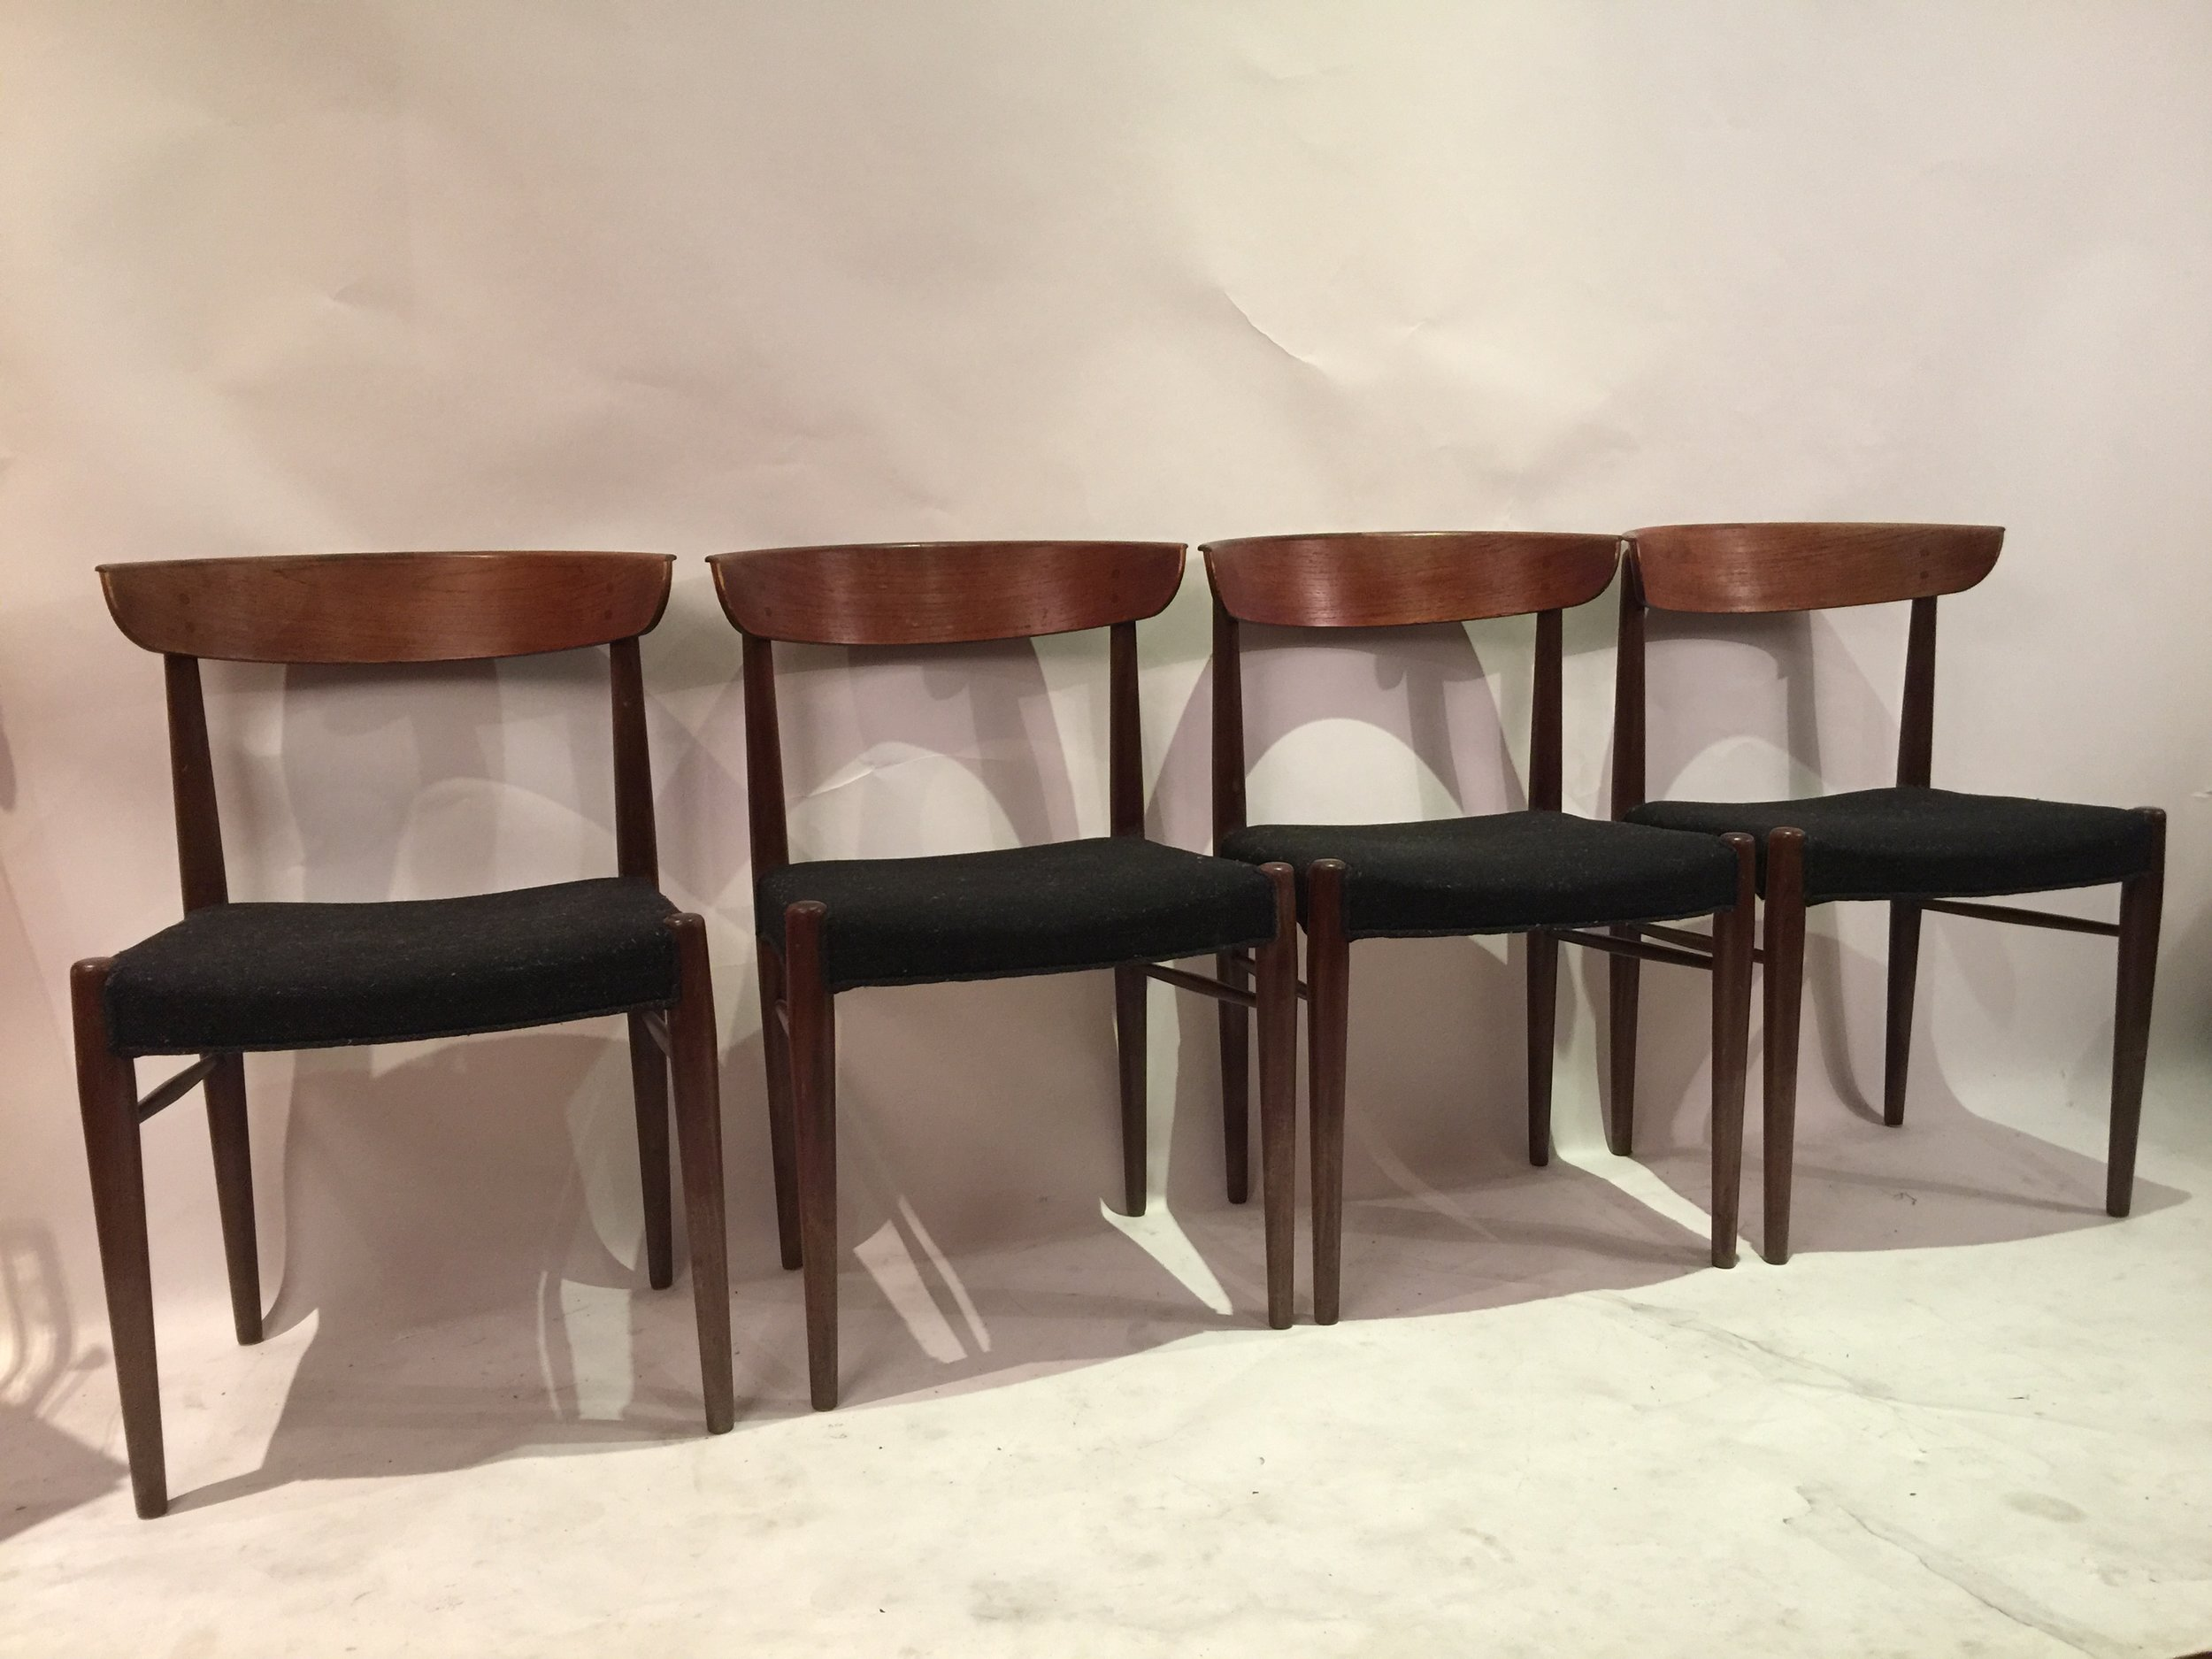 danish peg joint danish chairs in teak 7.JPG